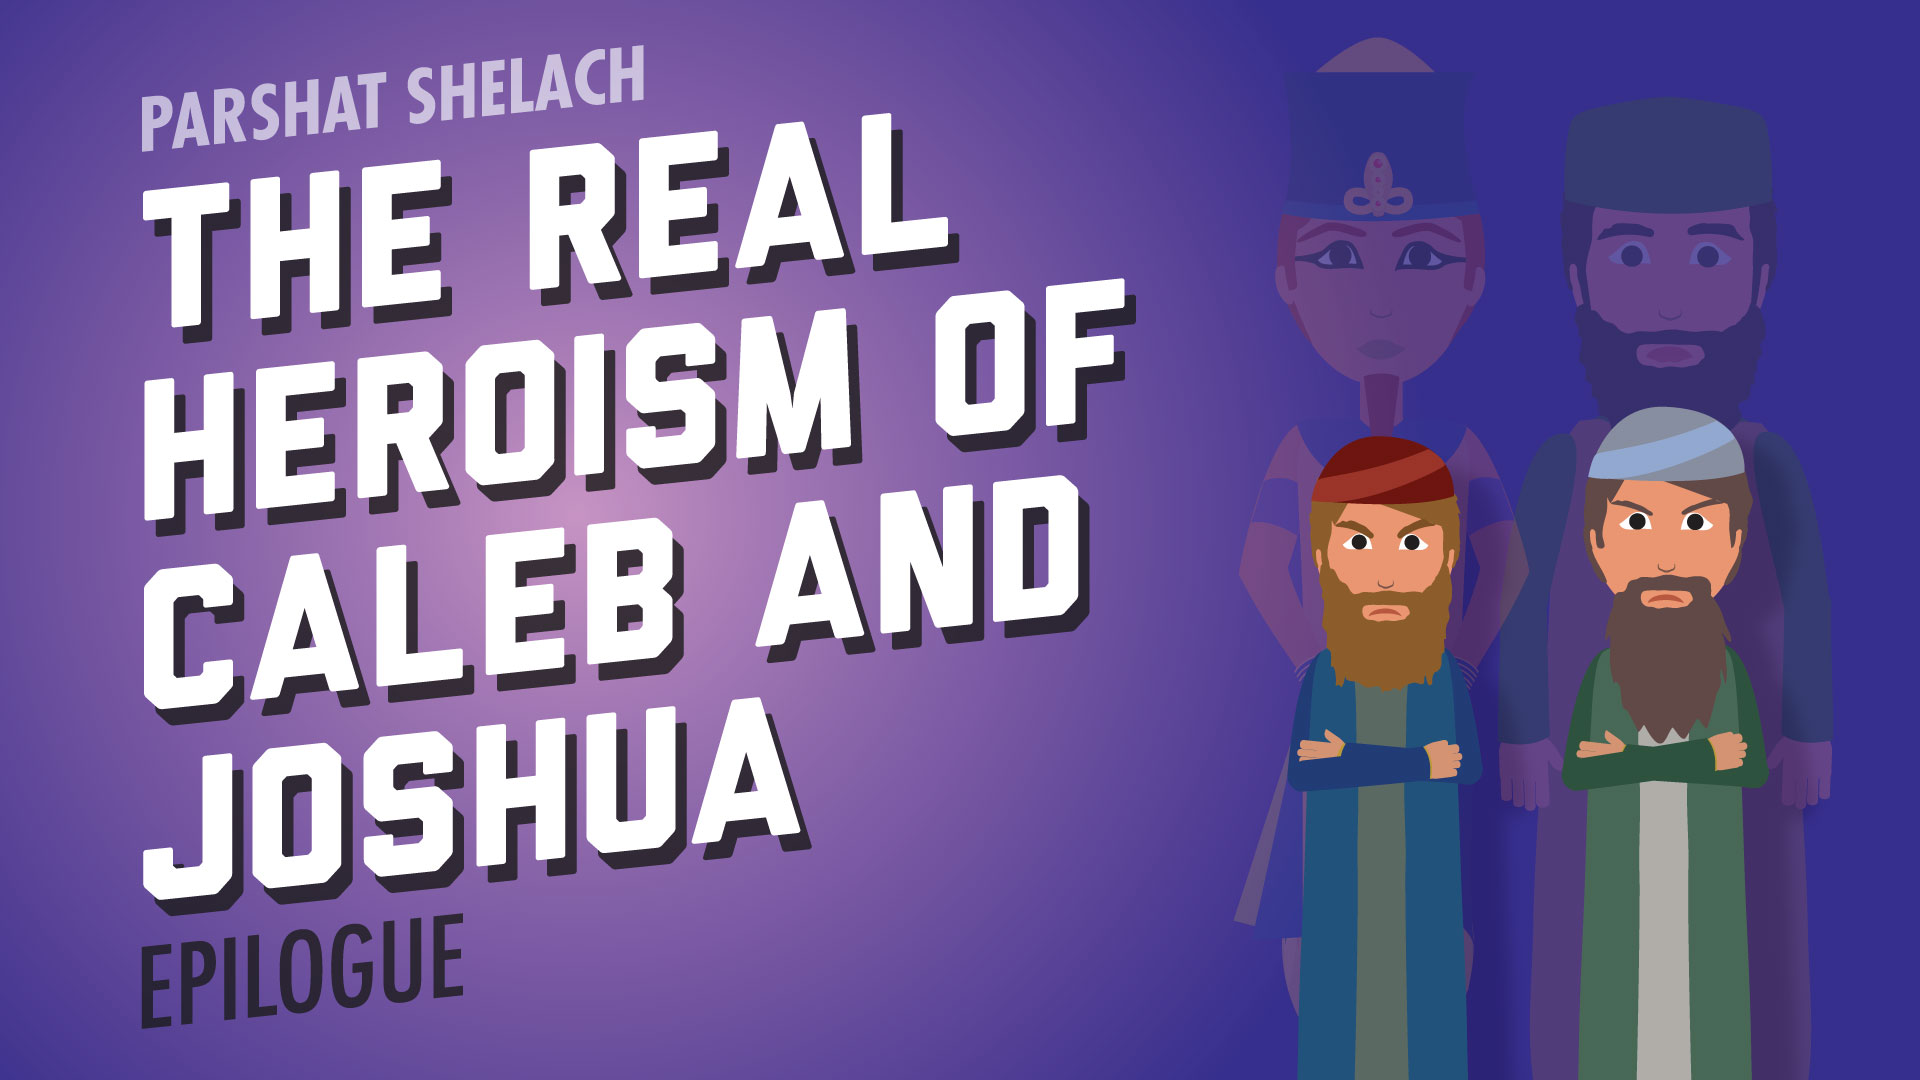 Epilogue: The Real Heroism of Caleb and Joshua